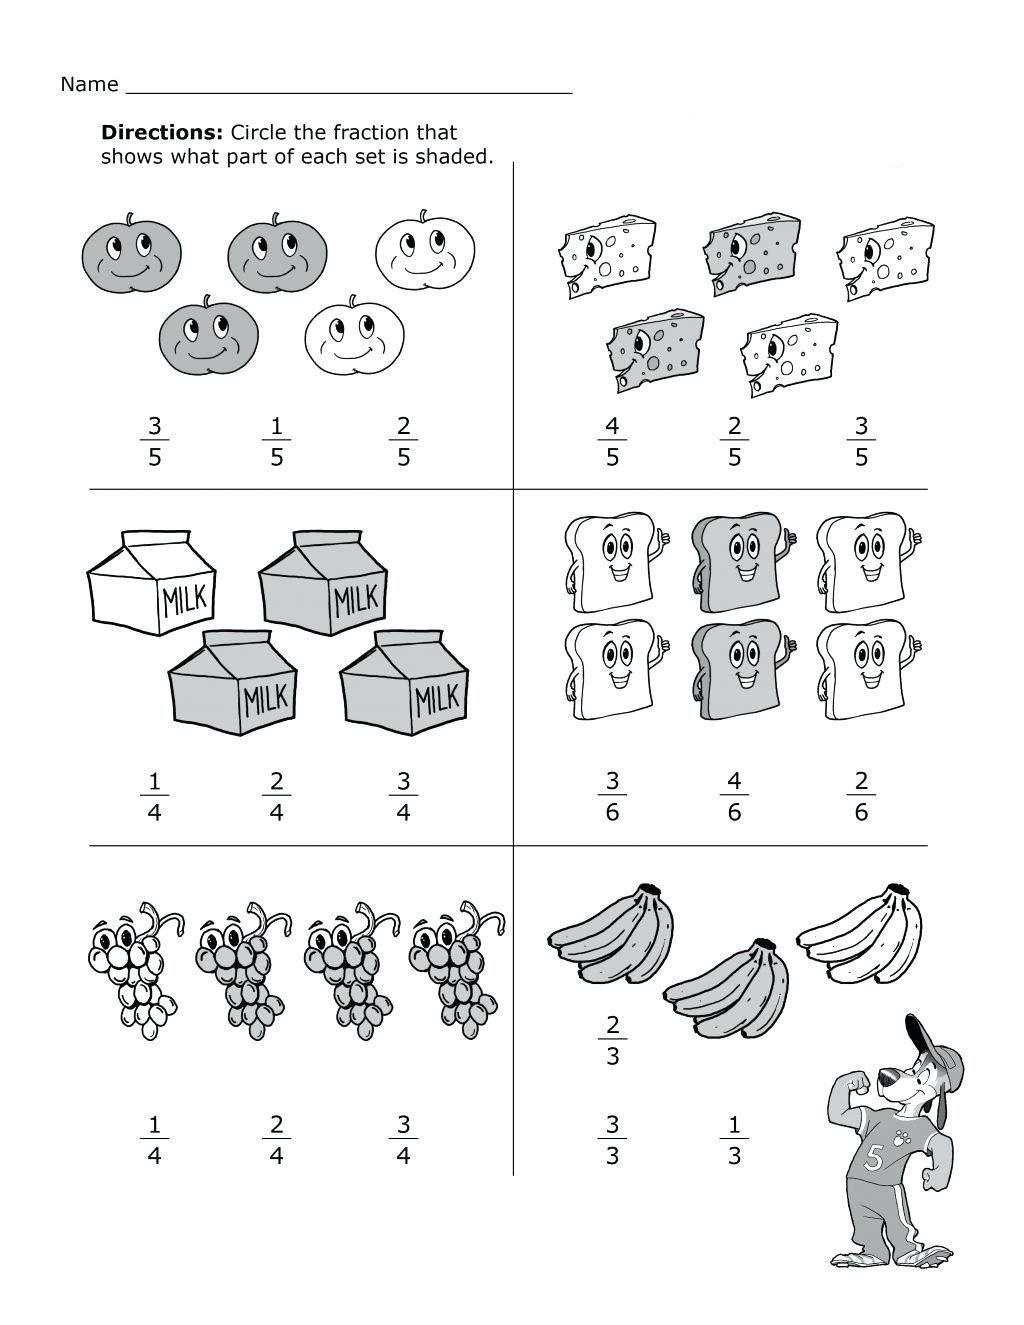 small resolution of 2nd Grade Fraction Worksheets 2nd Grade Math Worksheets Best Coloring Pages  for Kids   Fractions worksheets